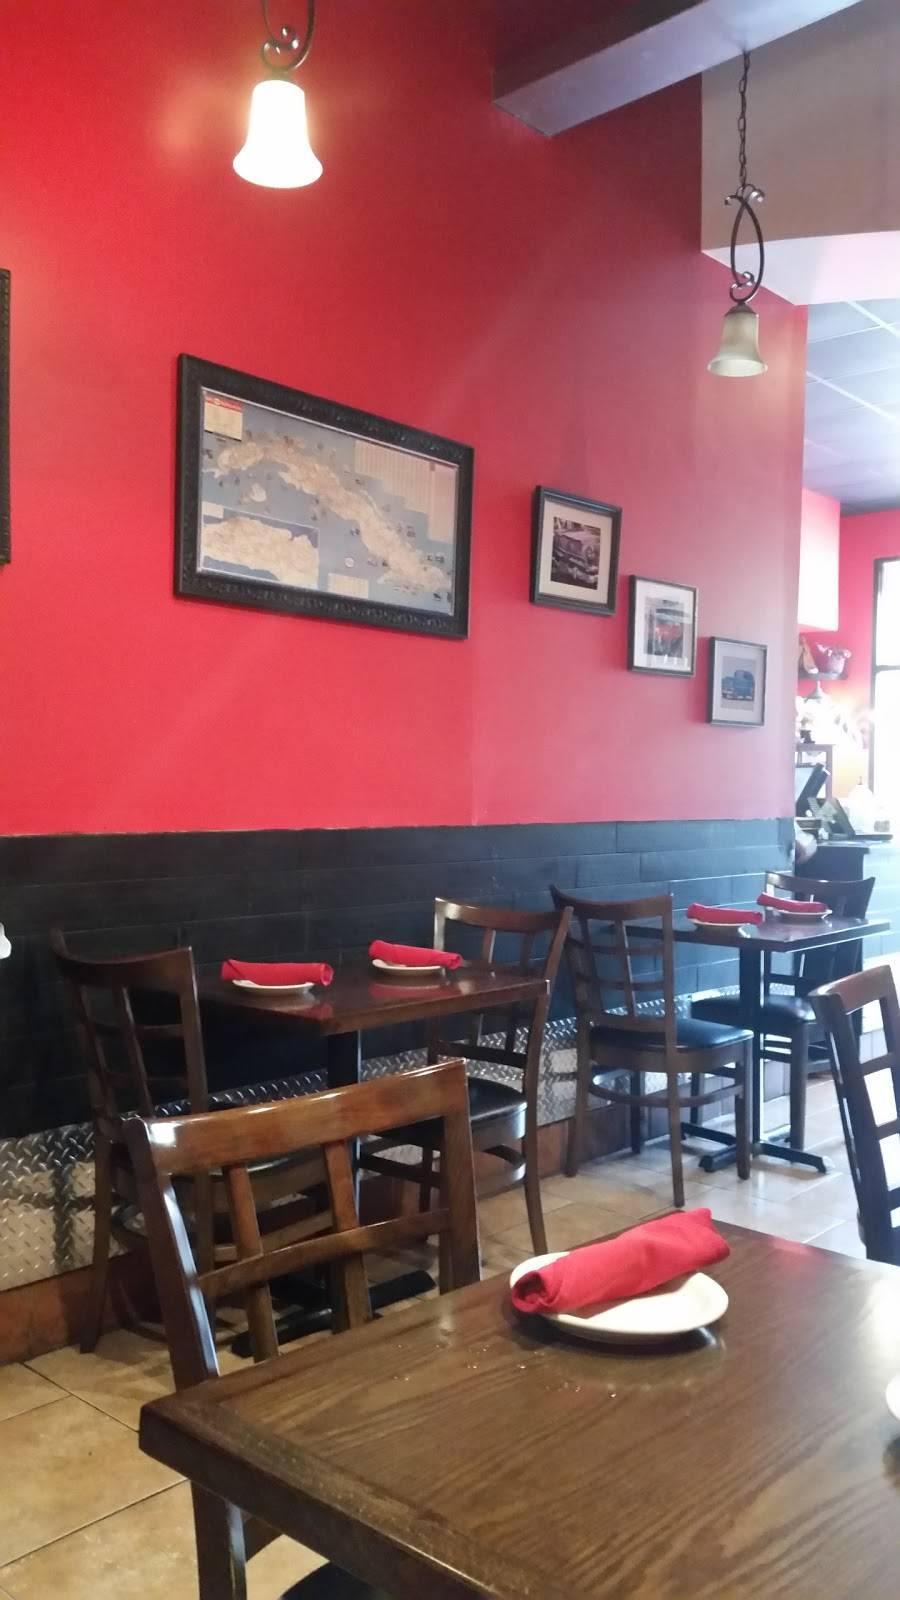 Havanas Cuban Cafe | restaurant | 824 River Rd, Edgewater, NJ 07020, USA | 2018862100 OR +1 201-886-2100